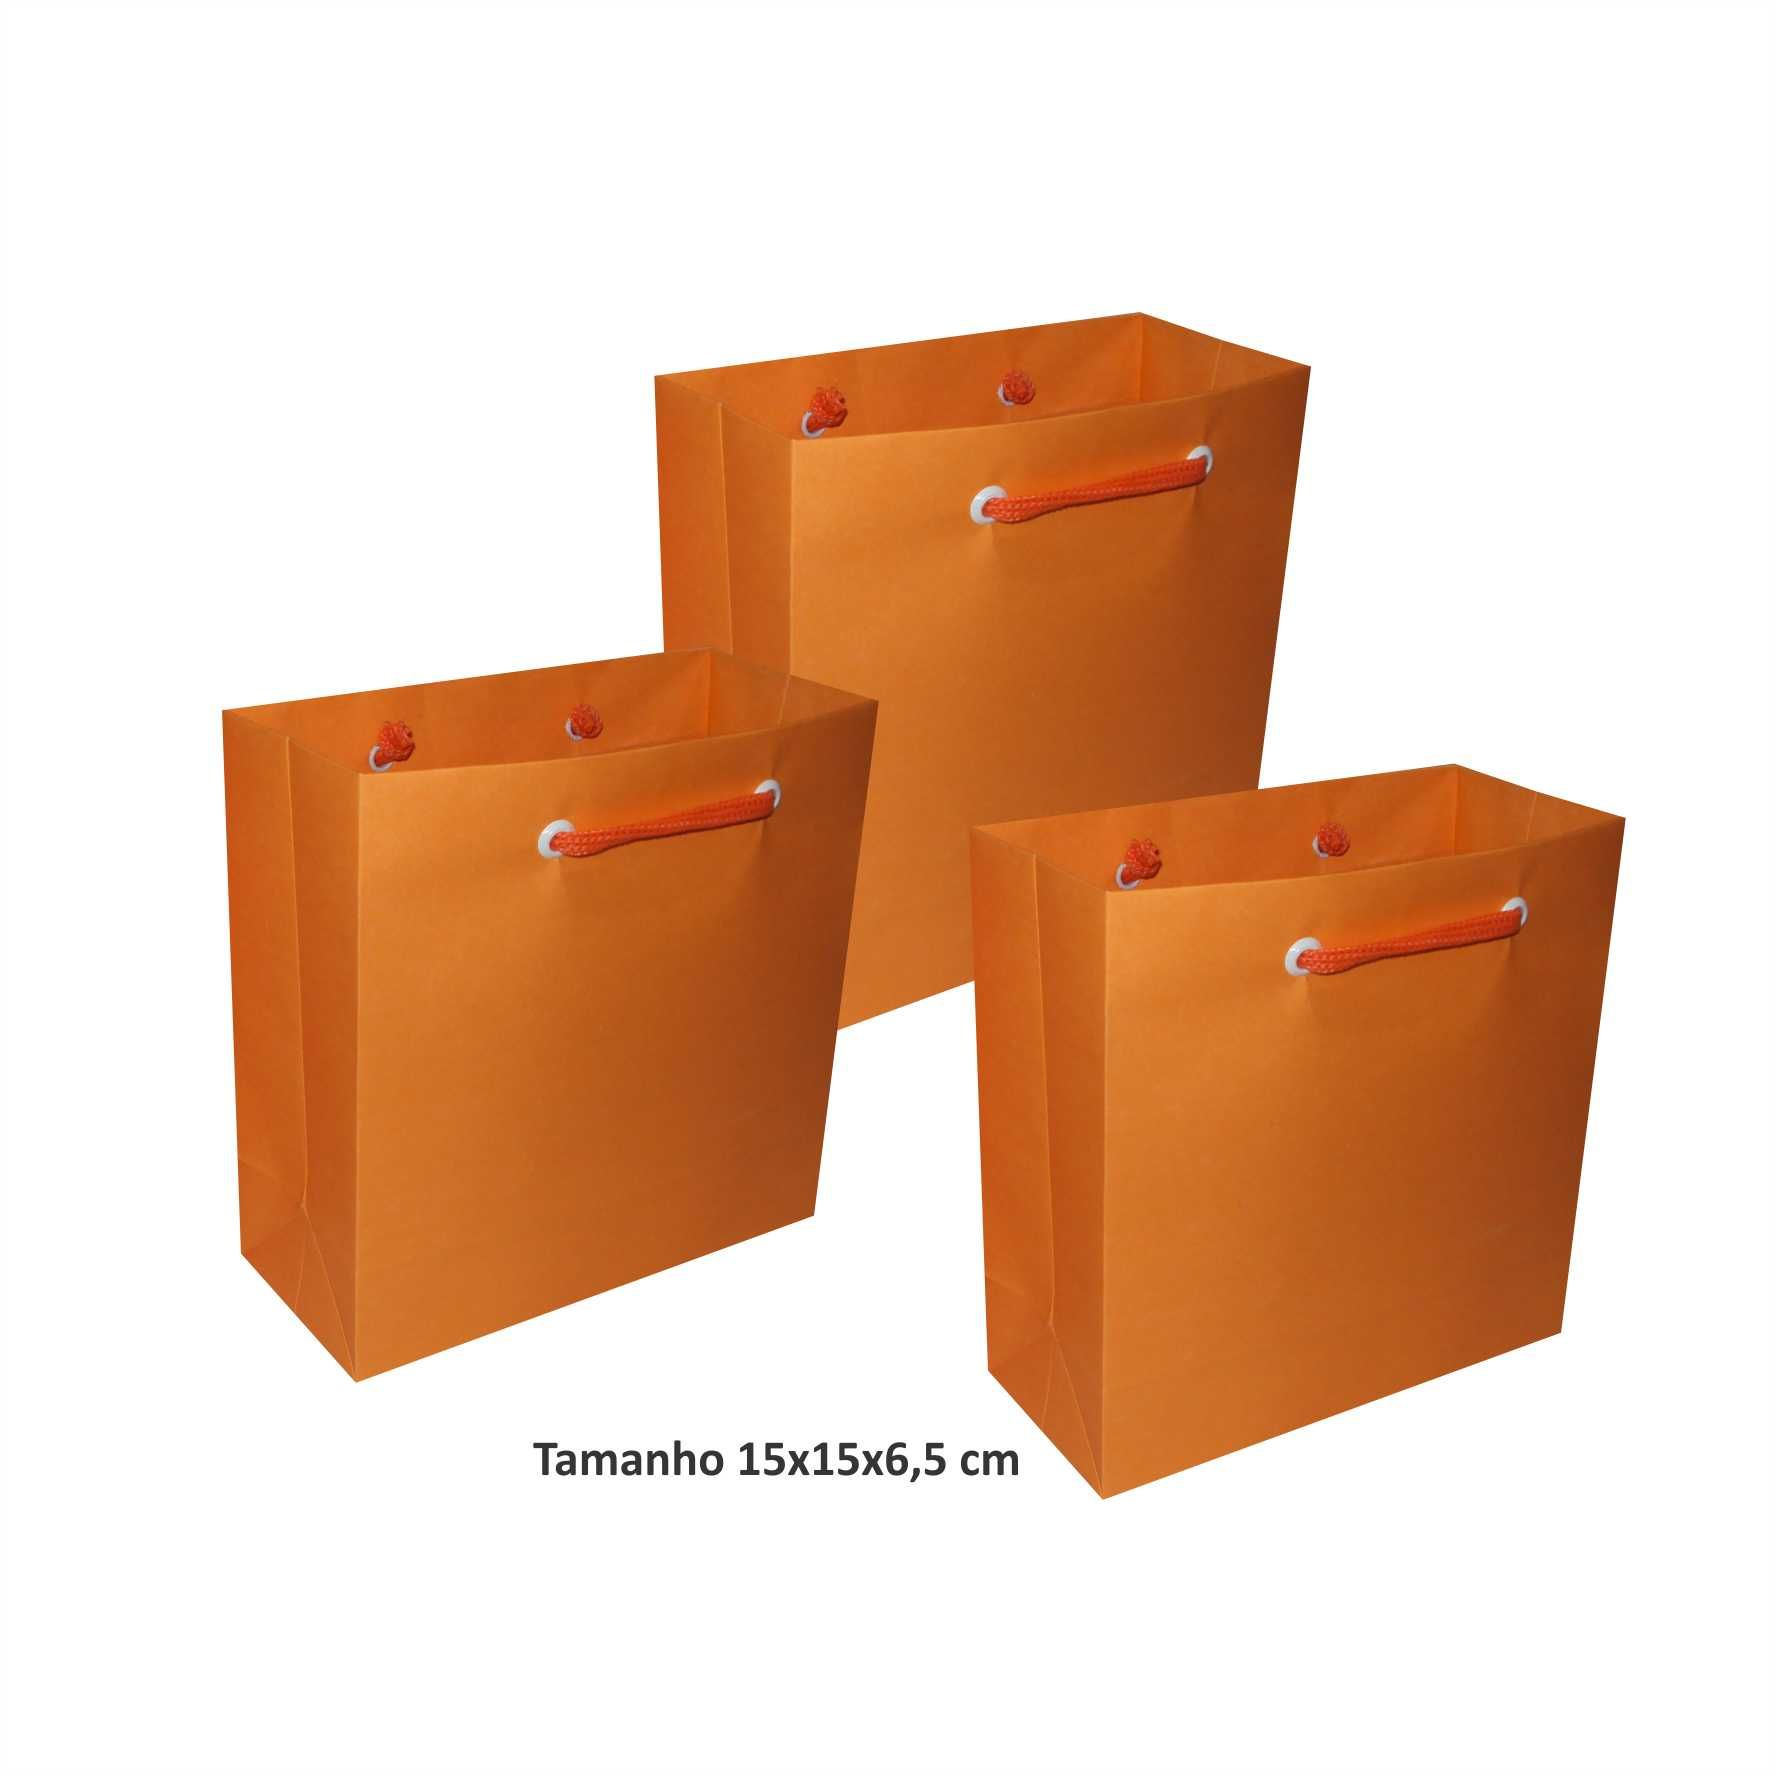 Sacola de papel Pequena (15x15x6,5 cm) laranja - 10 unidades